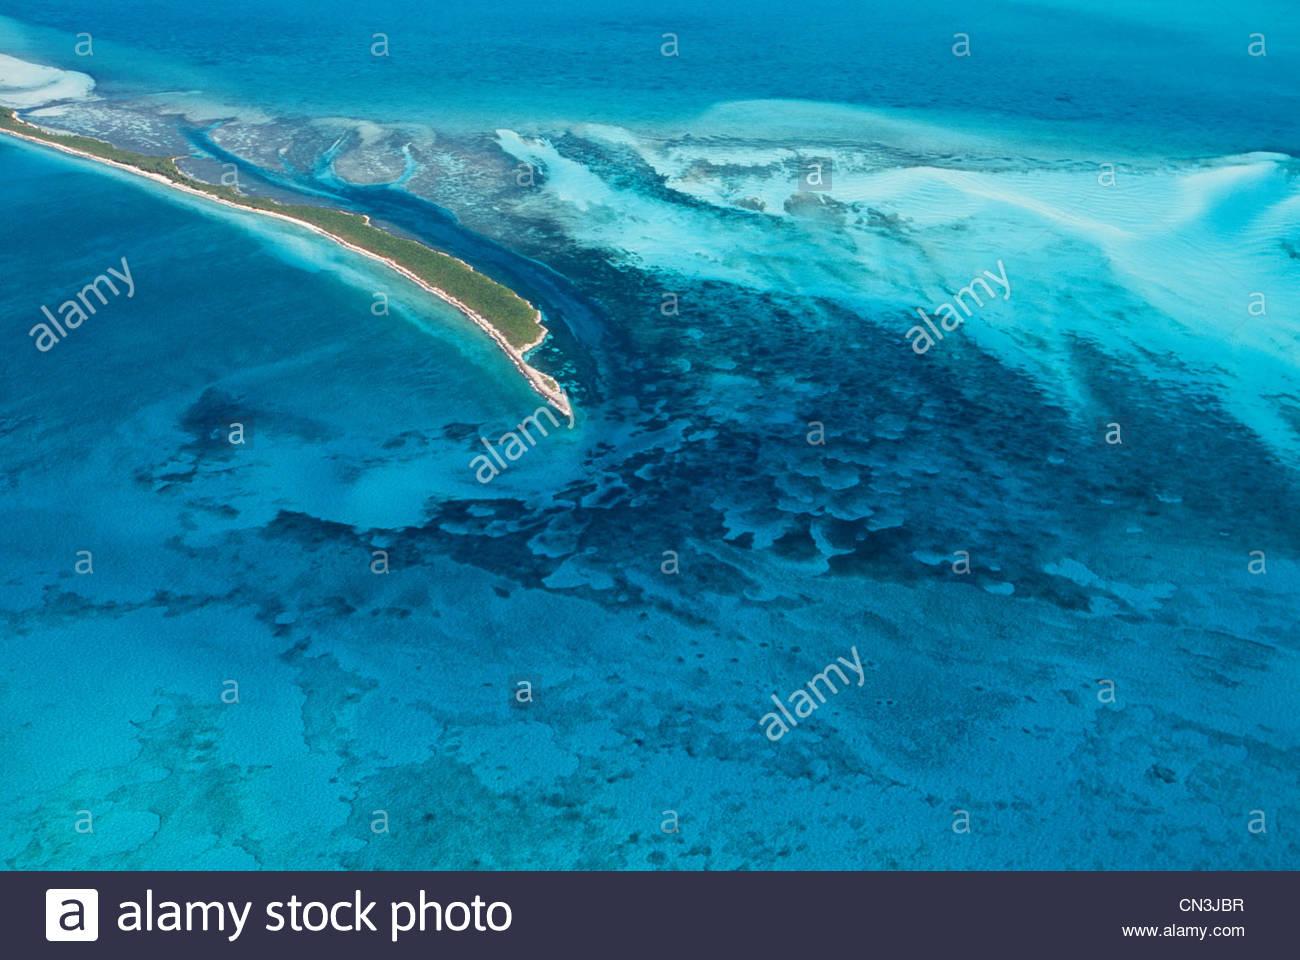 Aerial, Bimini Islands, Great Bahamas Bank, Bahamas - Stock Image